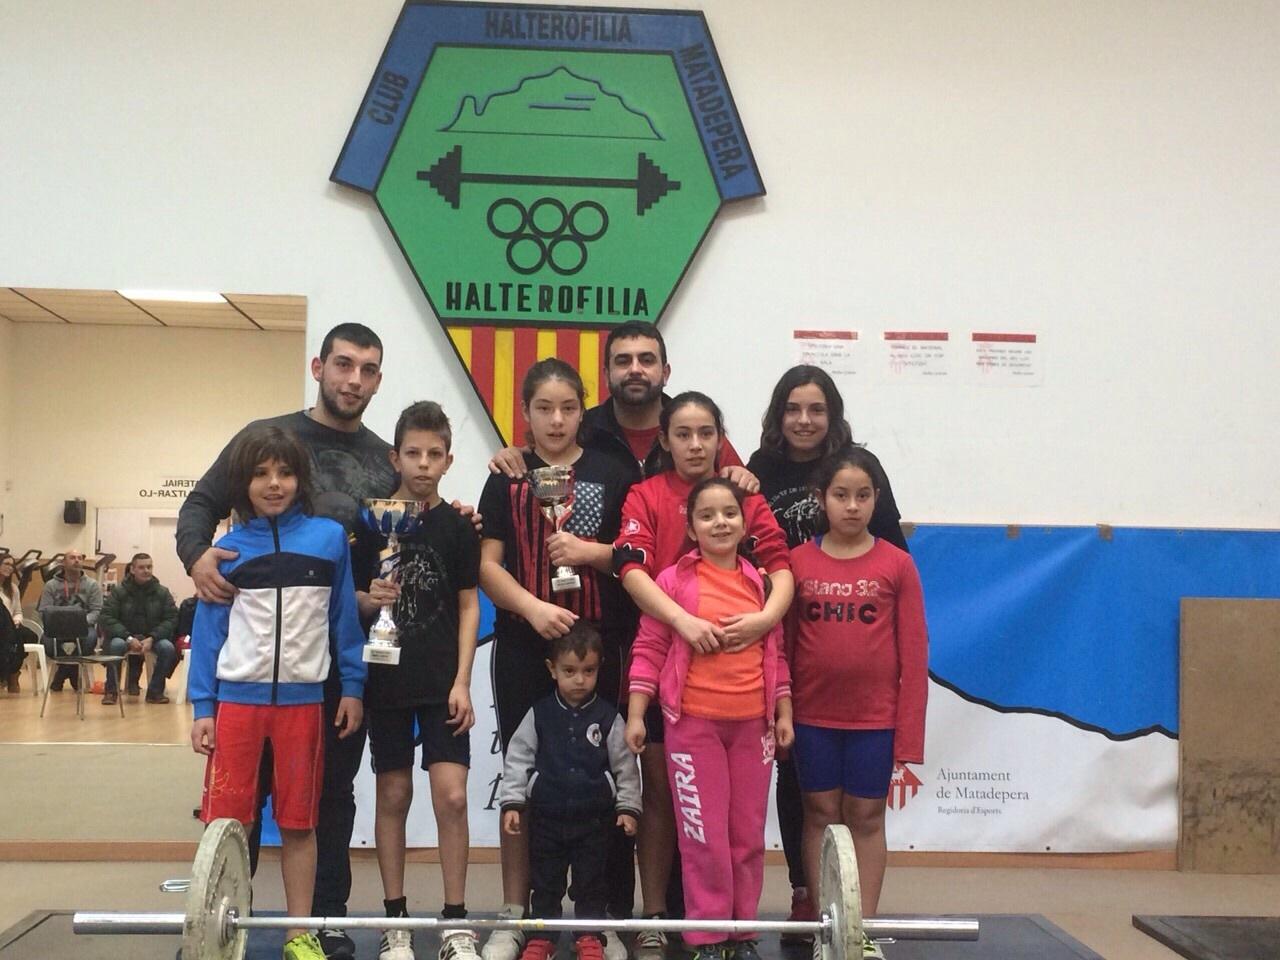 L'equip del Club Halterofília Molins de Rei en el Campionat de Catalunya de Matadepera // Club Halteroflía Molins de Rei